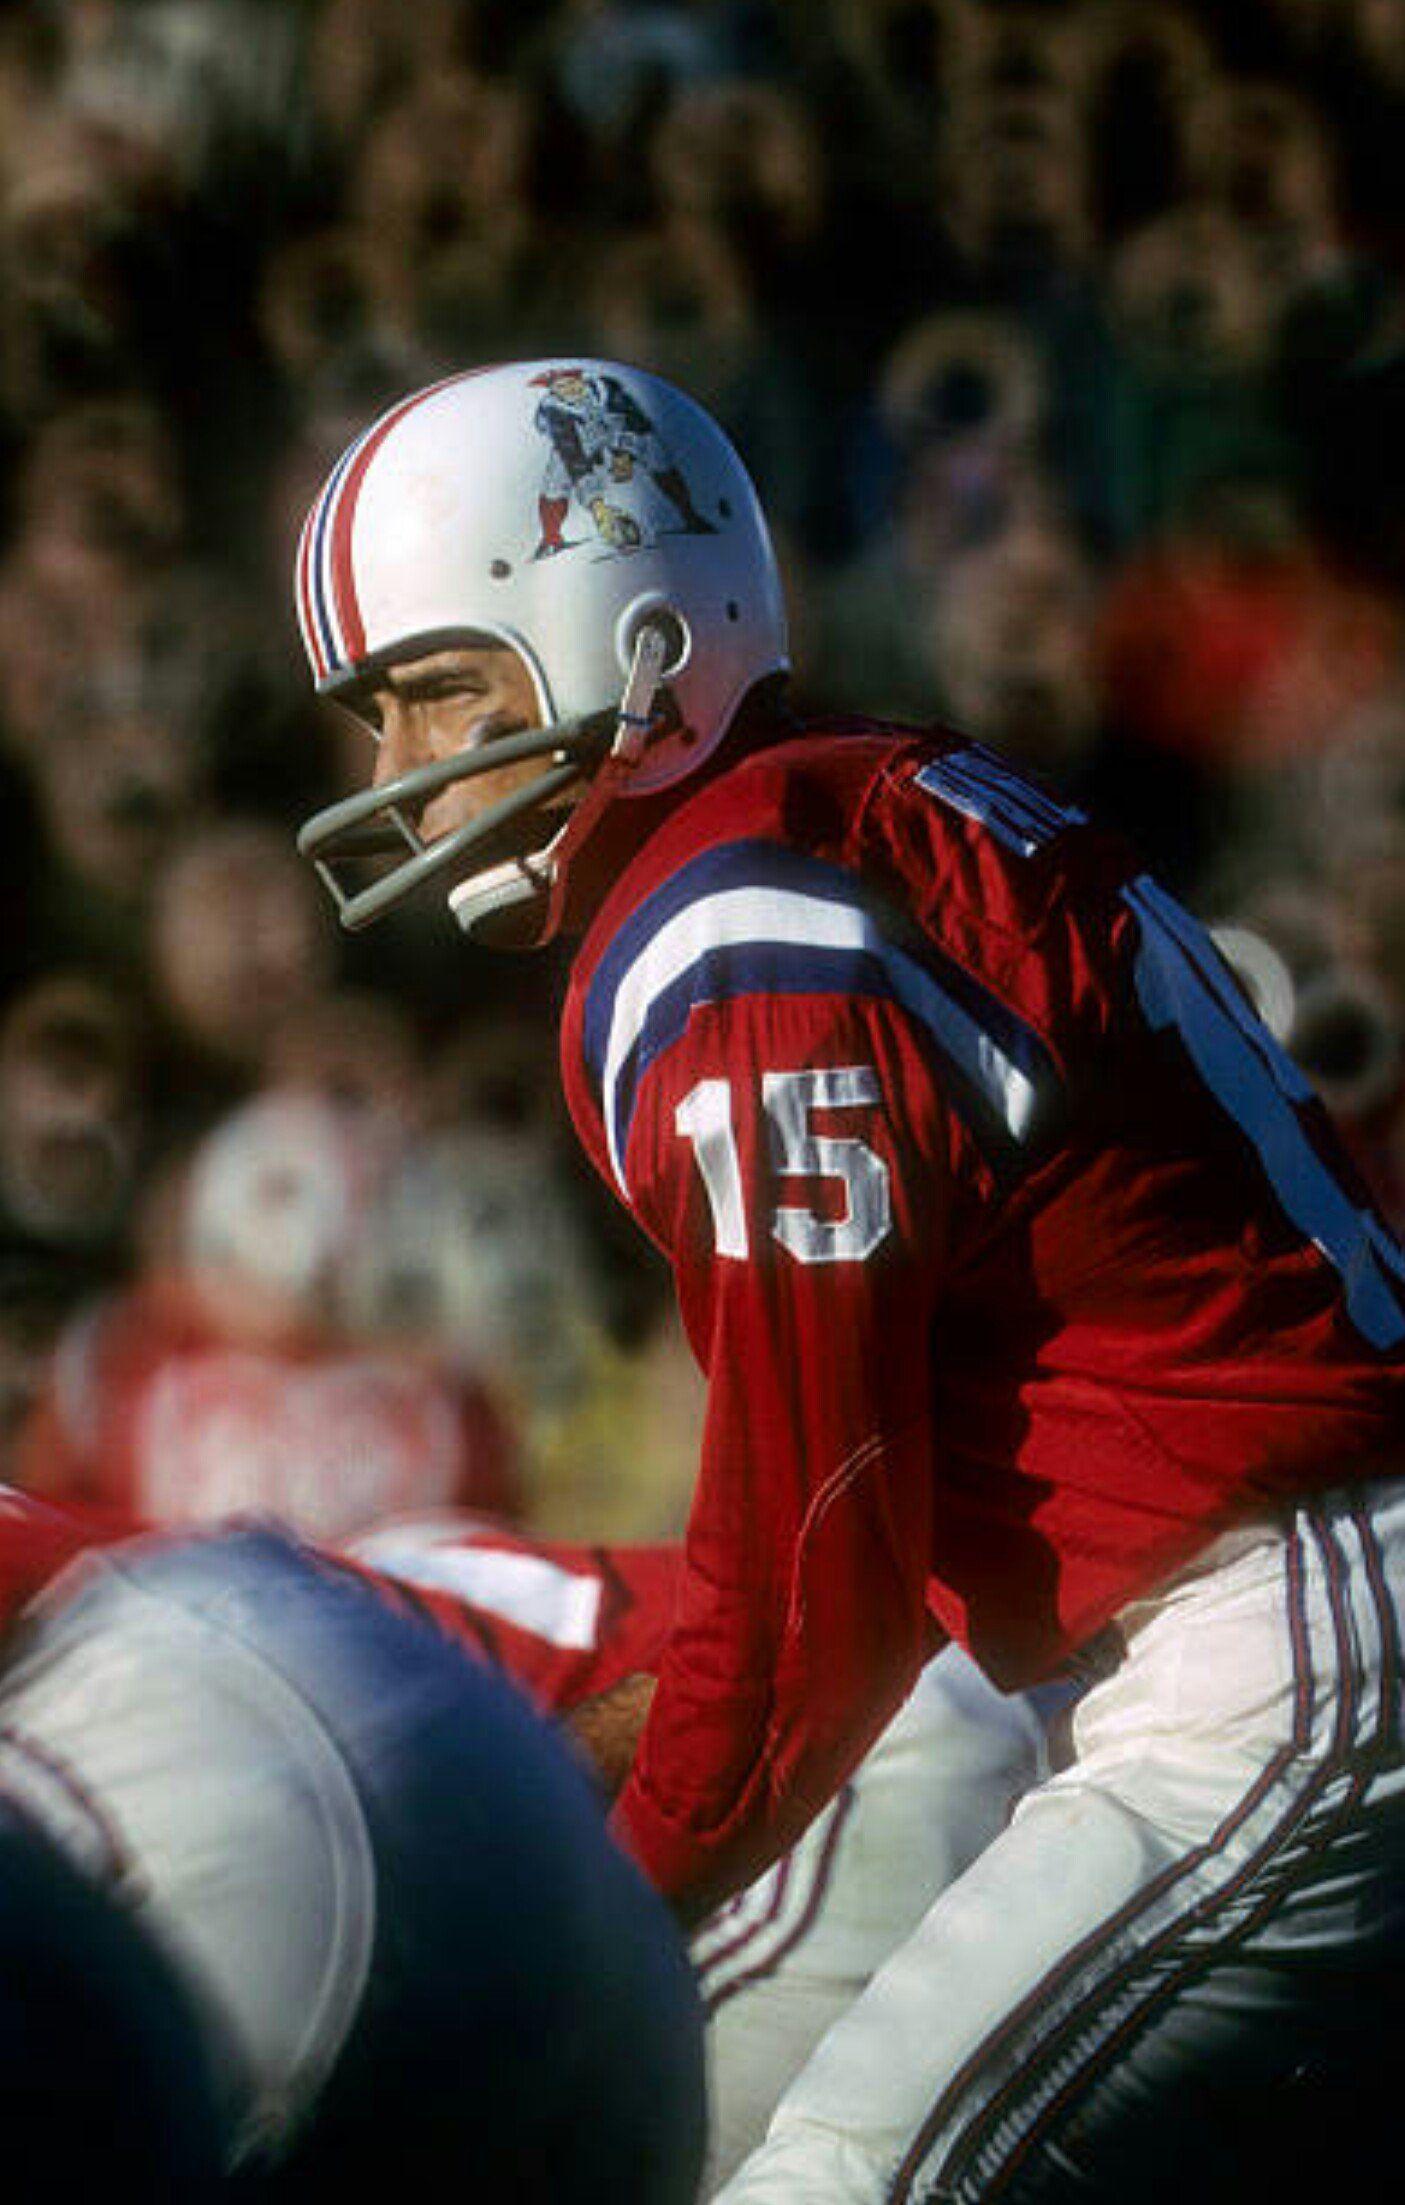 Boston Patriots Qb Babe Parilli American Football League Football Images Nfl Football Players